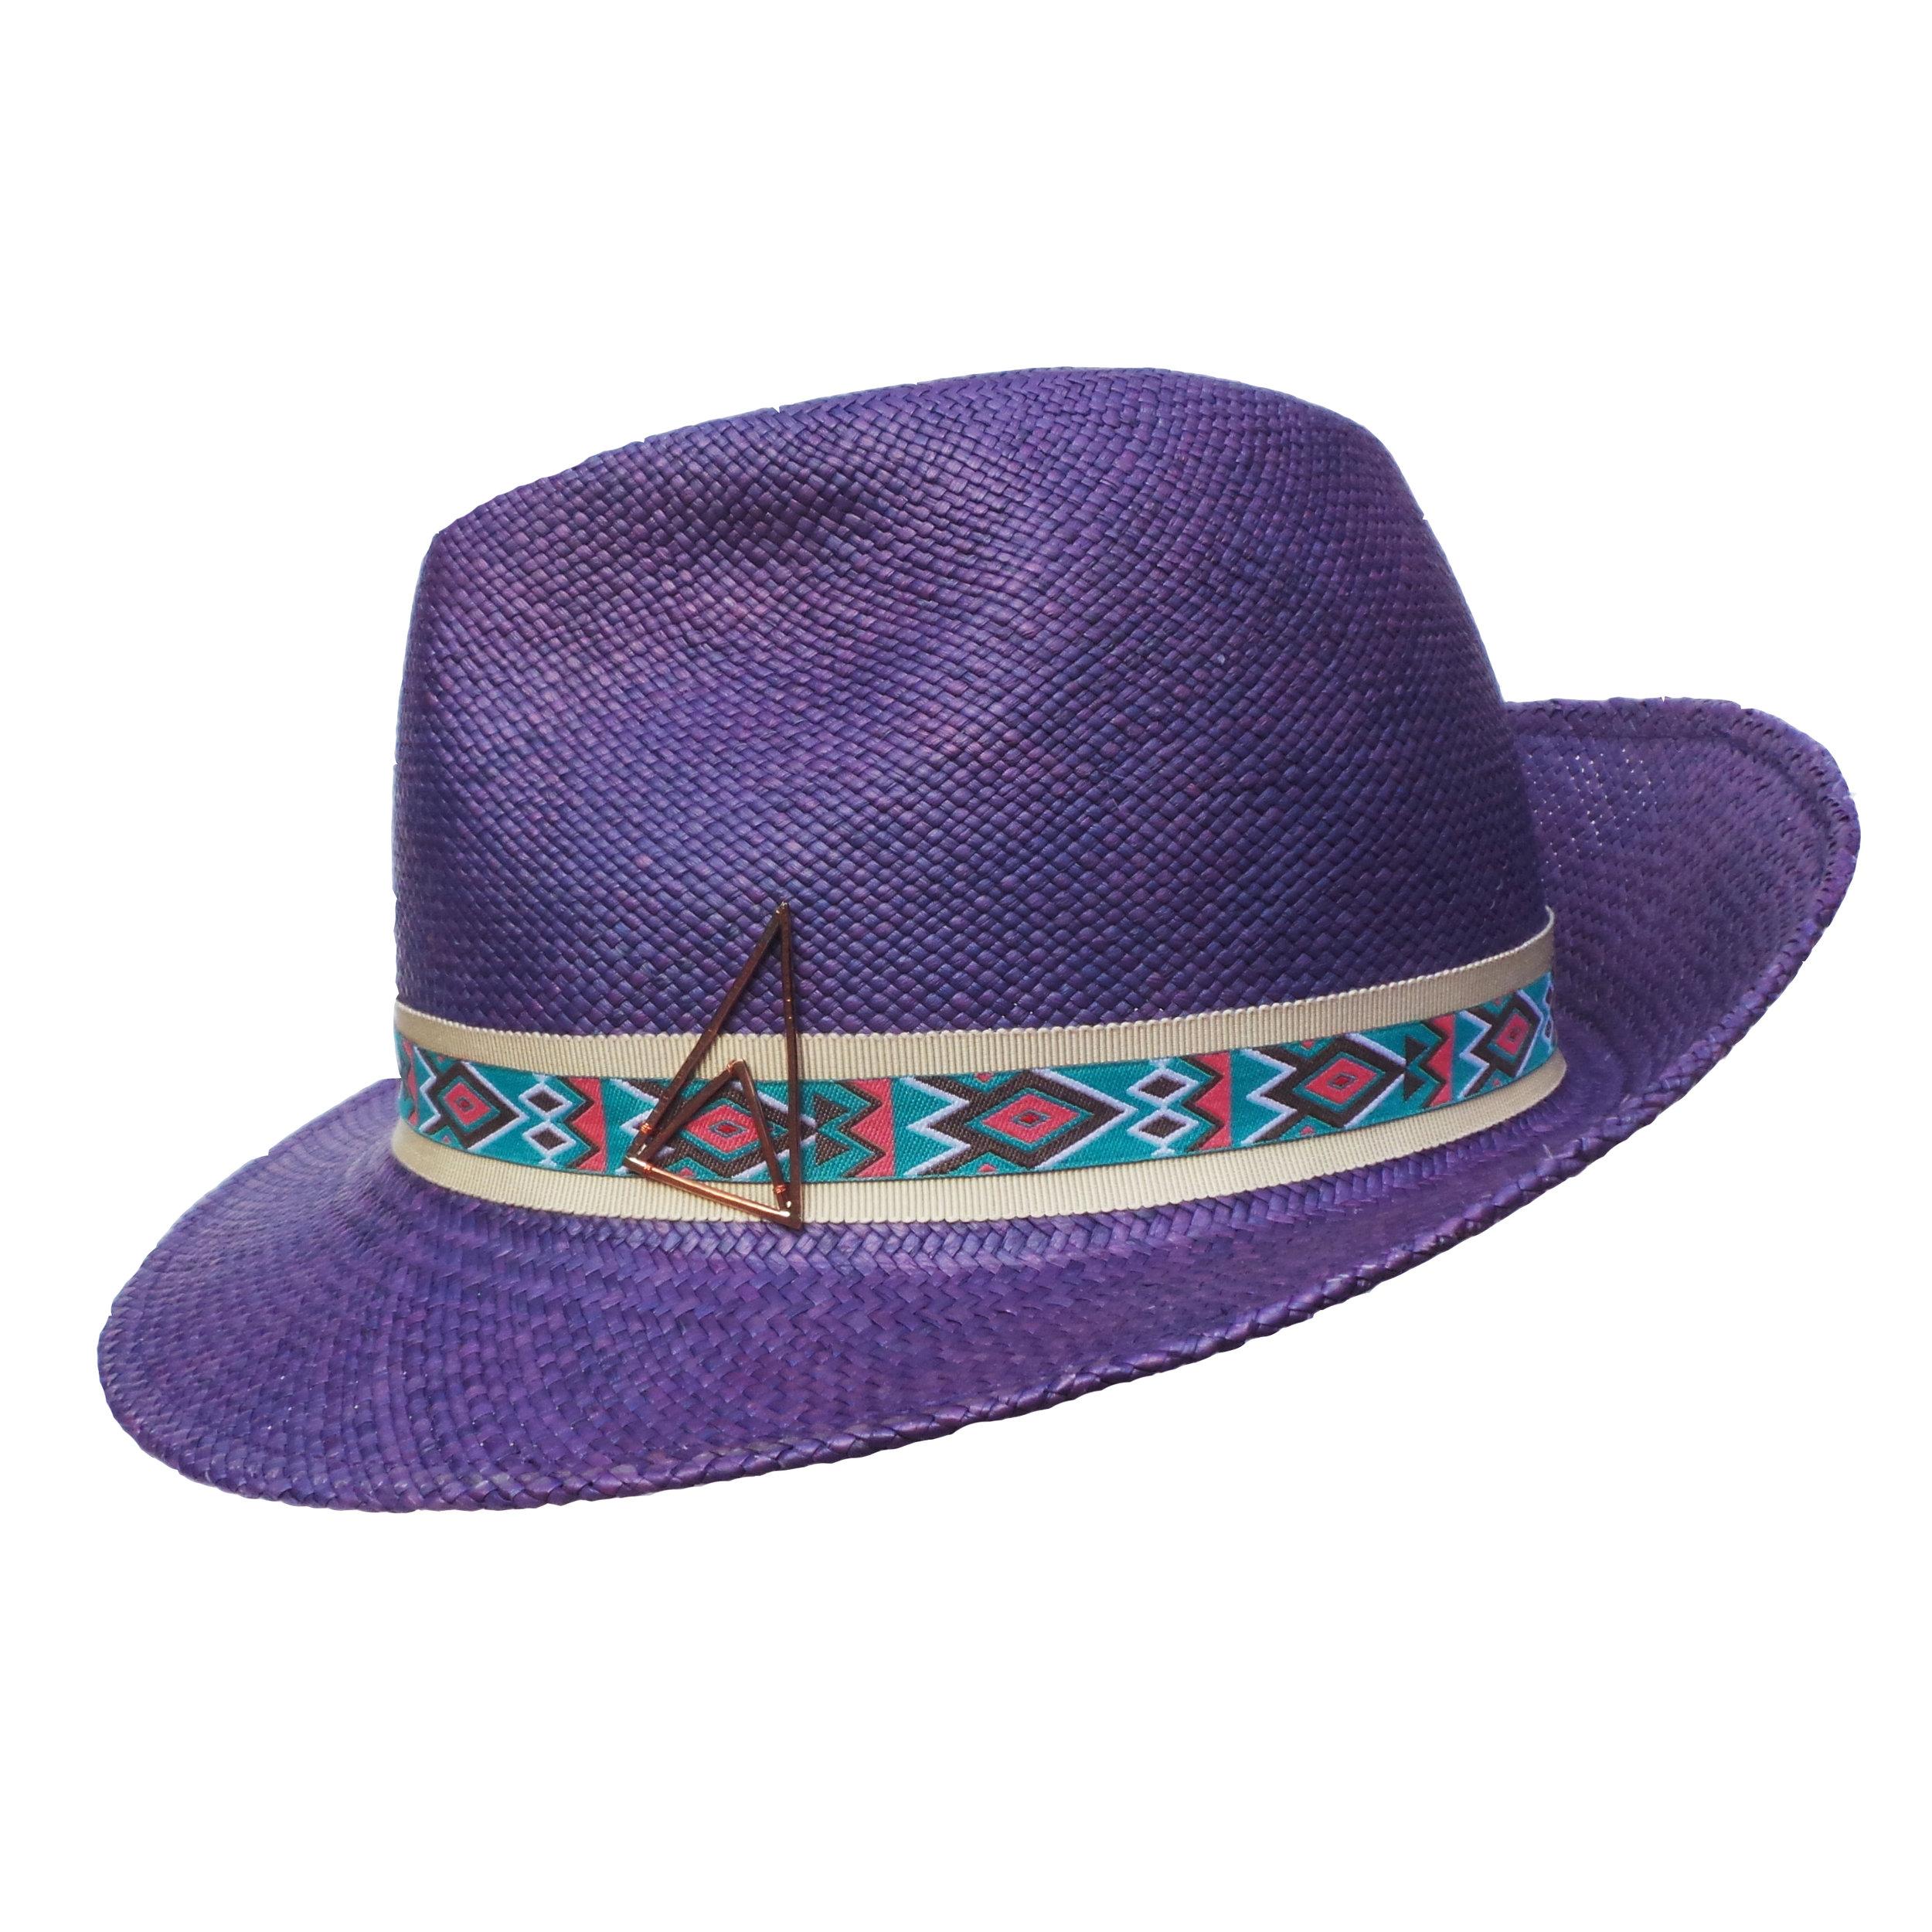 karasu hat 1 a.jpg